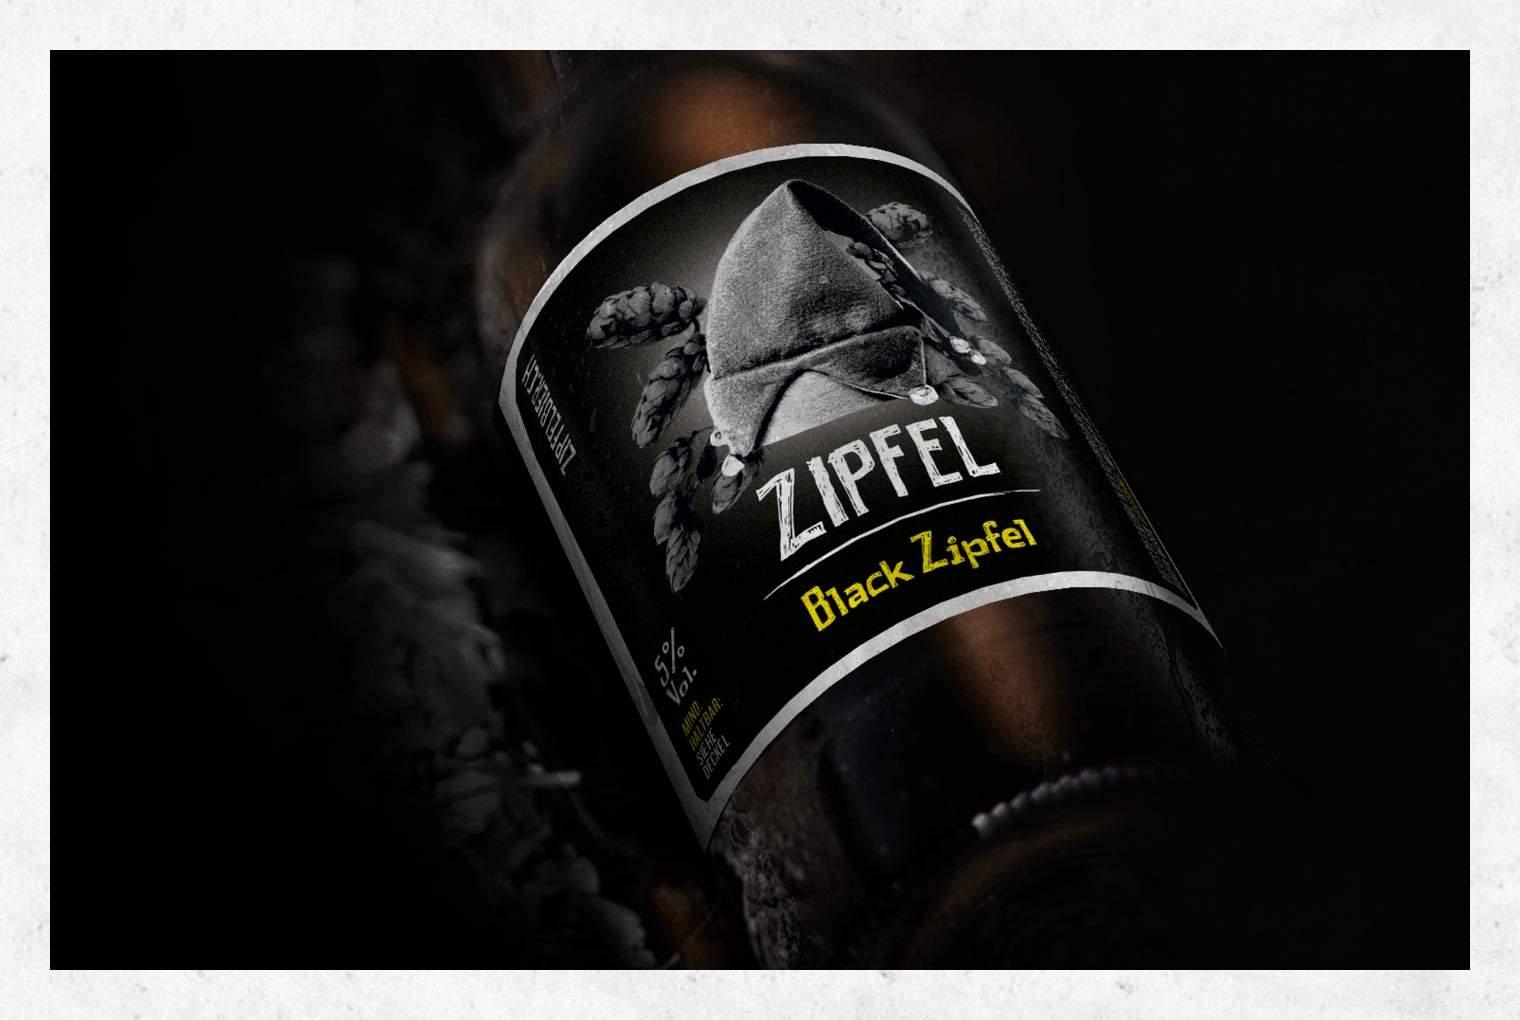 Zipfel_Bier_Black_Zipfel